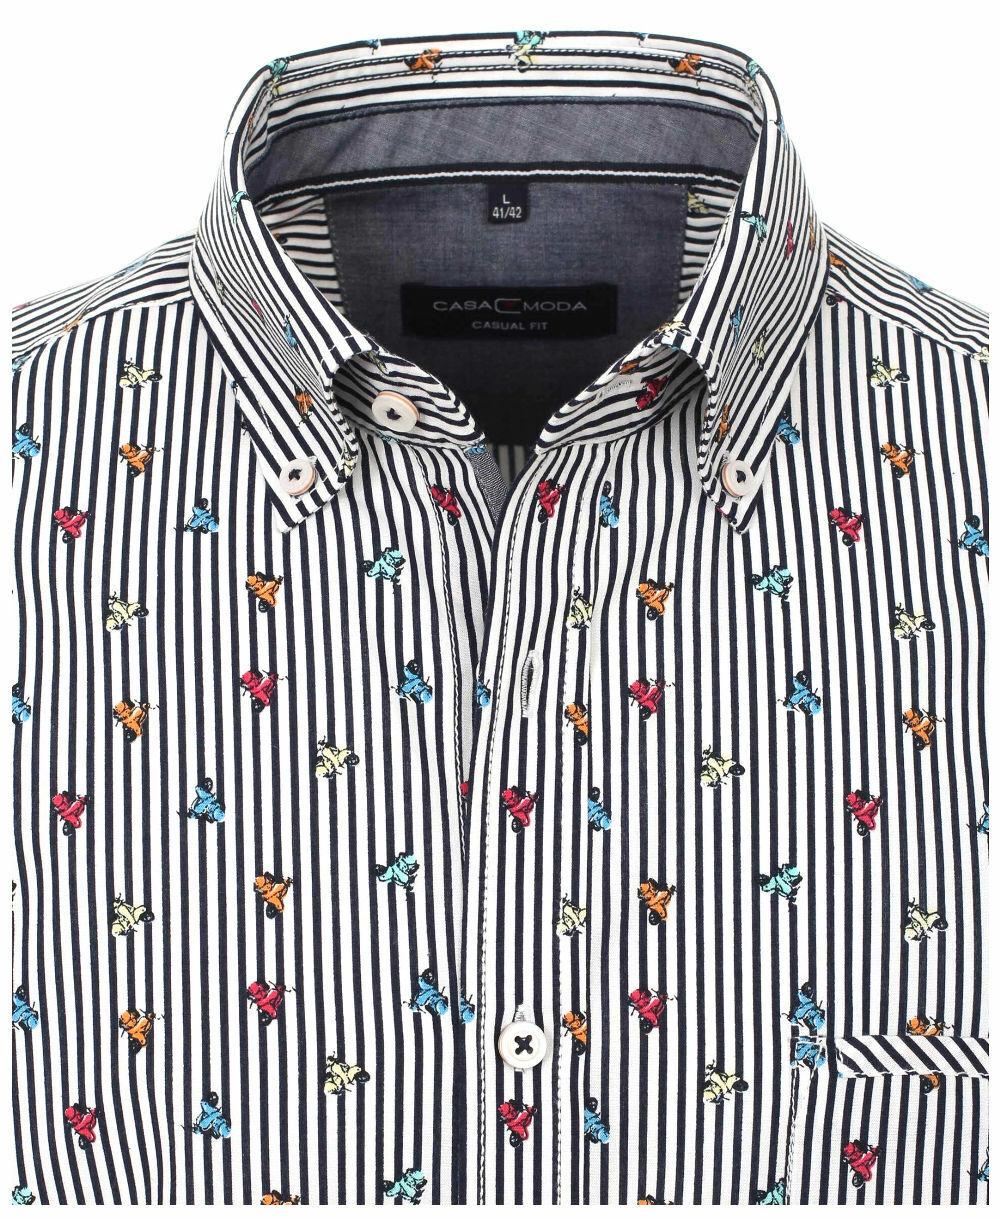 Kurzarmhemd Casamoda ClubEdition weiss dunkelblau Stripes Print bunt Vespa M-7XL